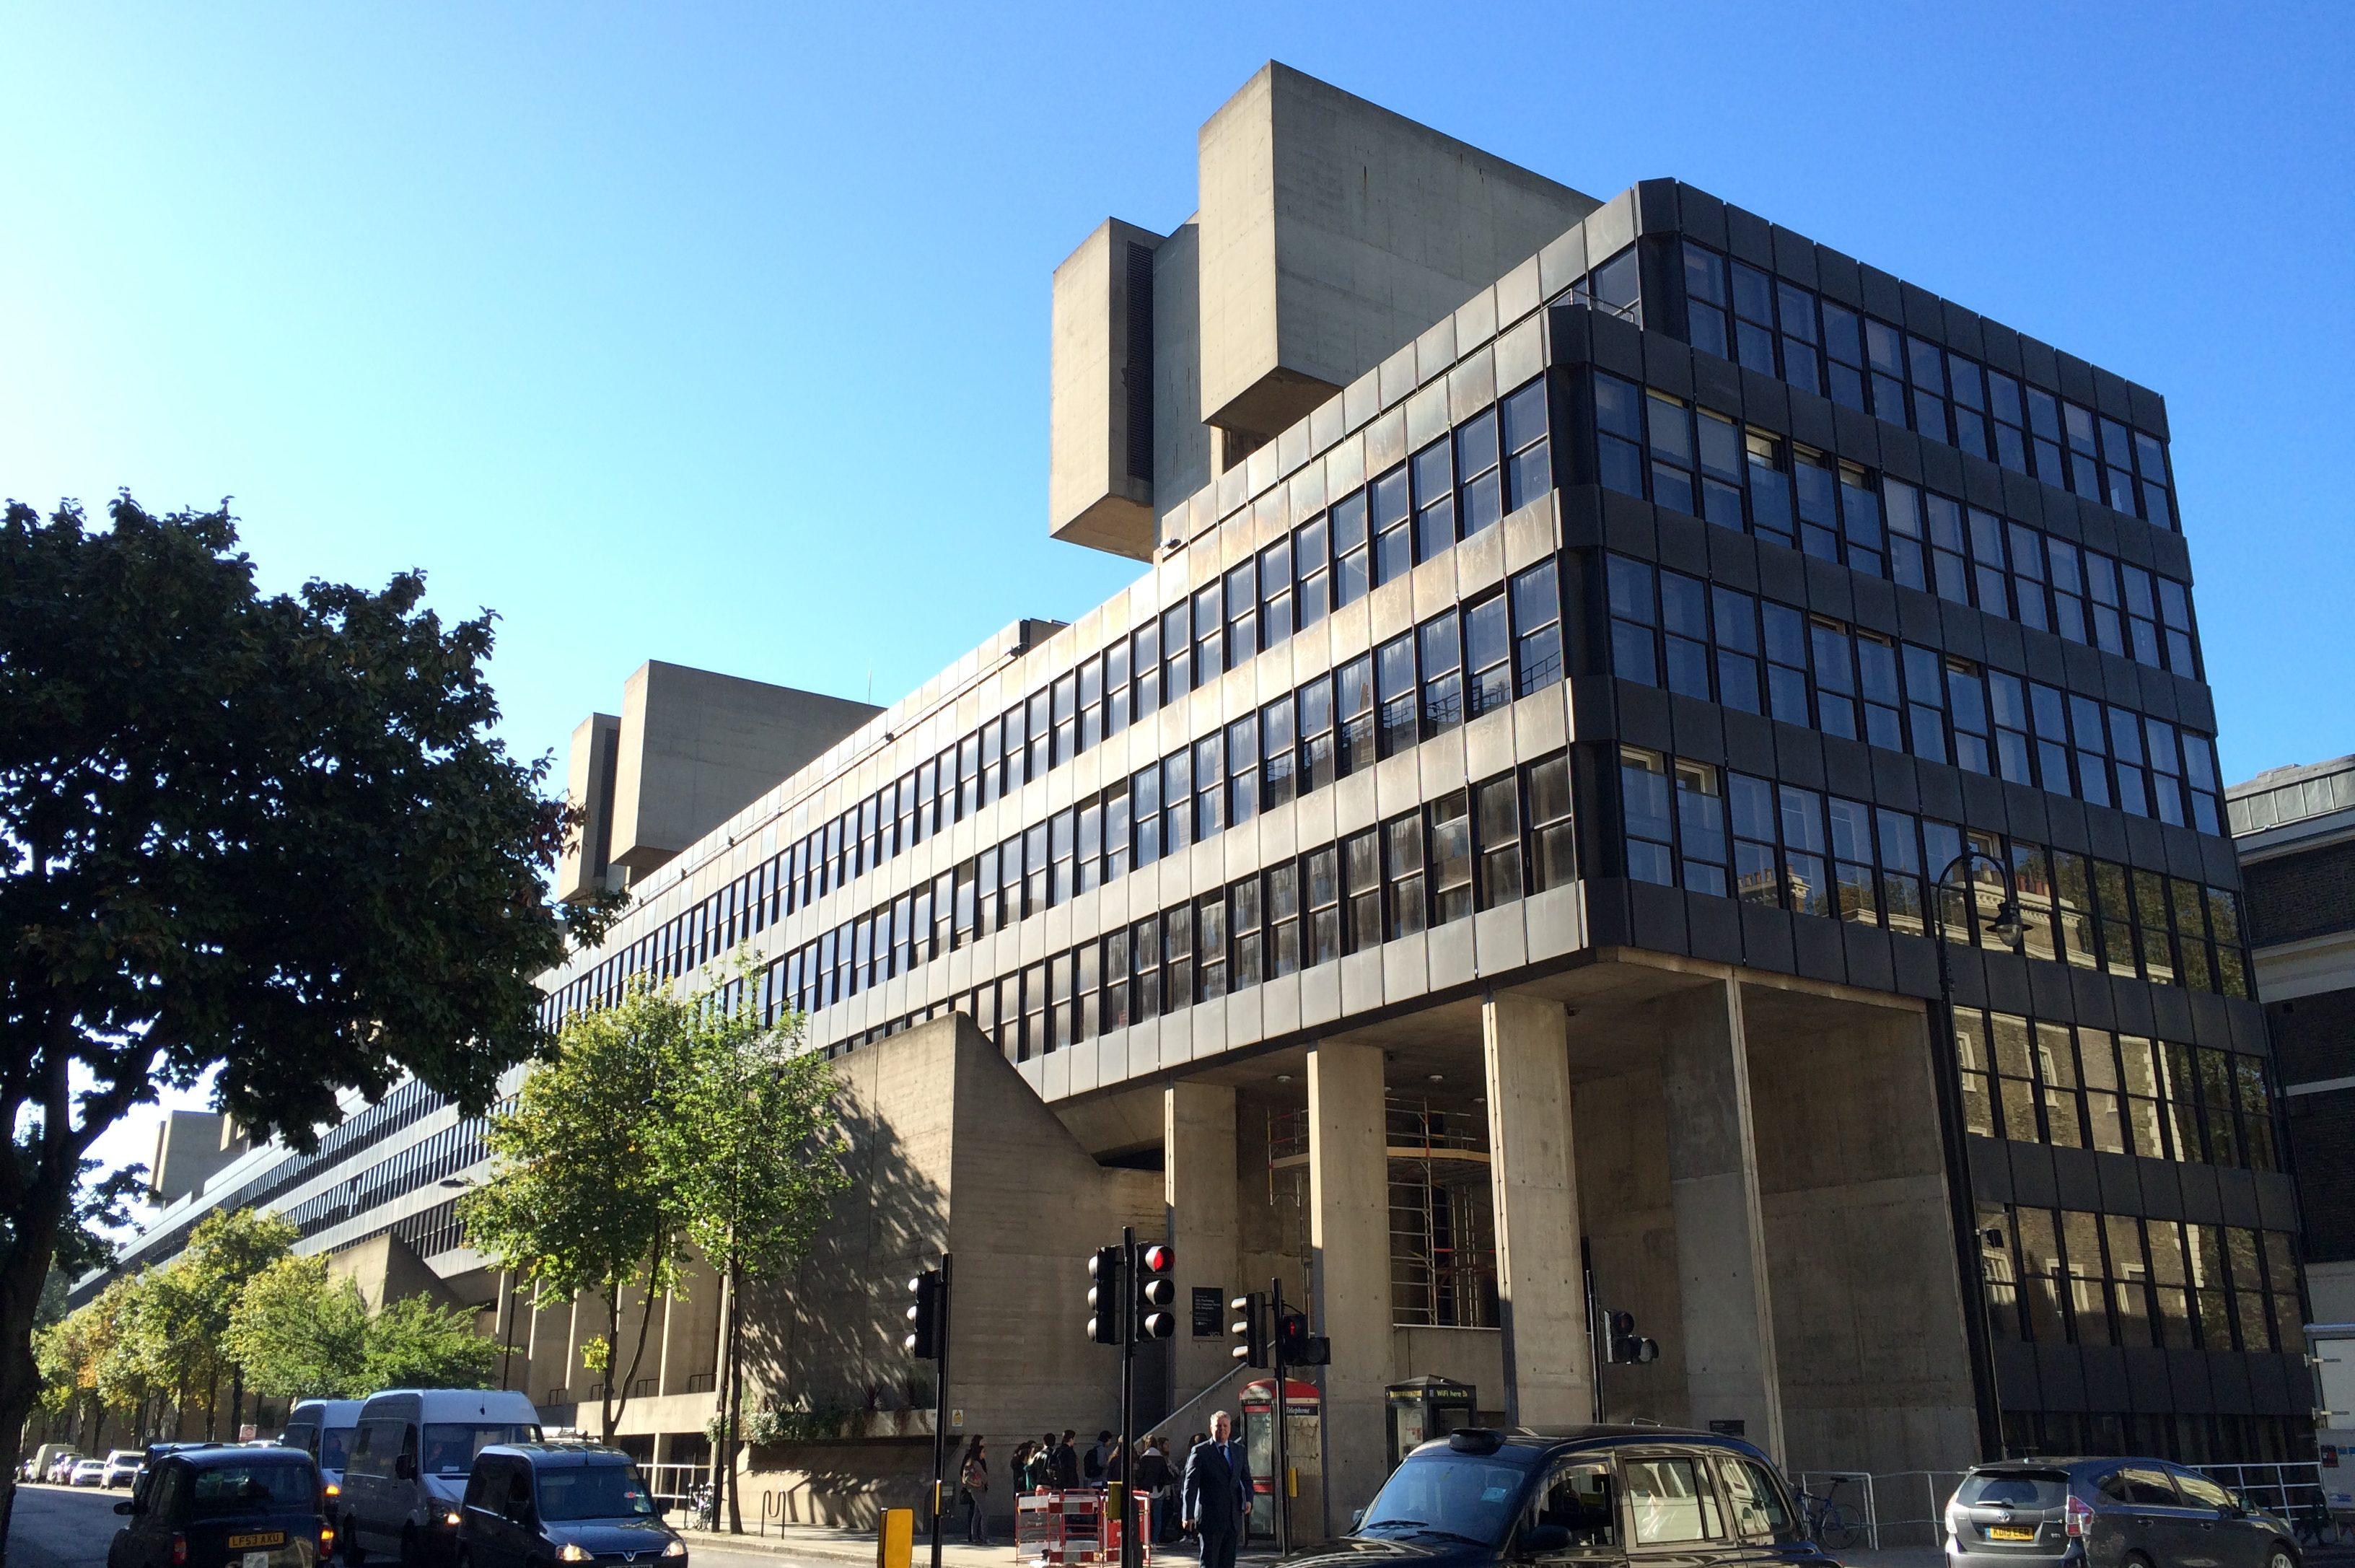 Institute of Education, University College London